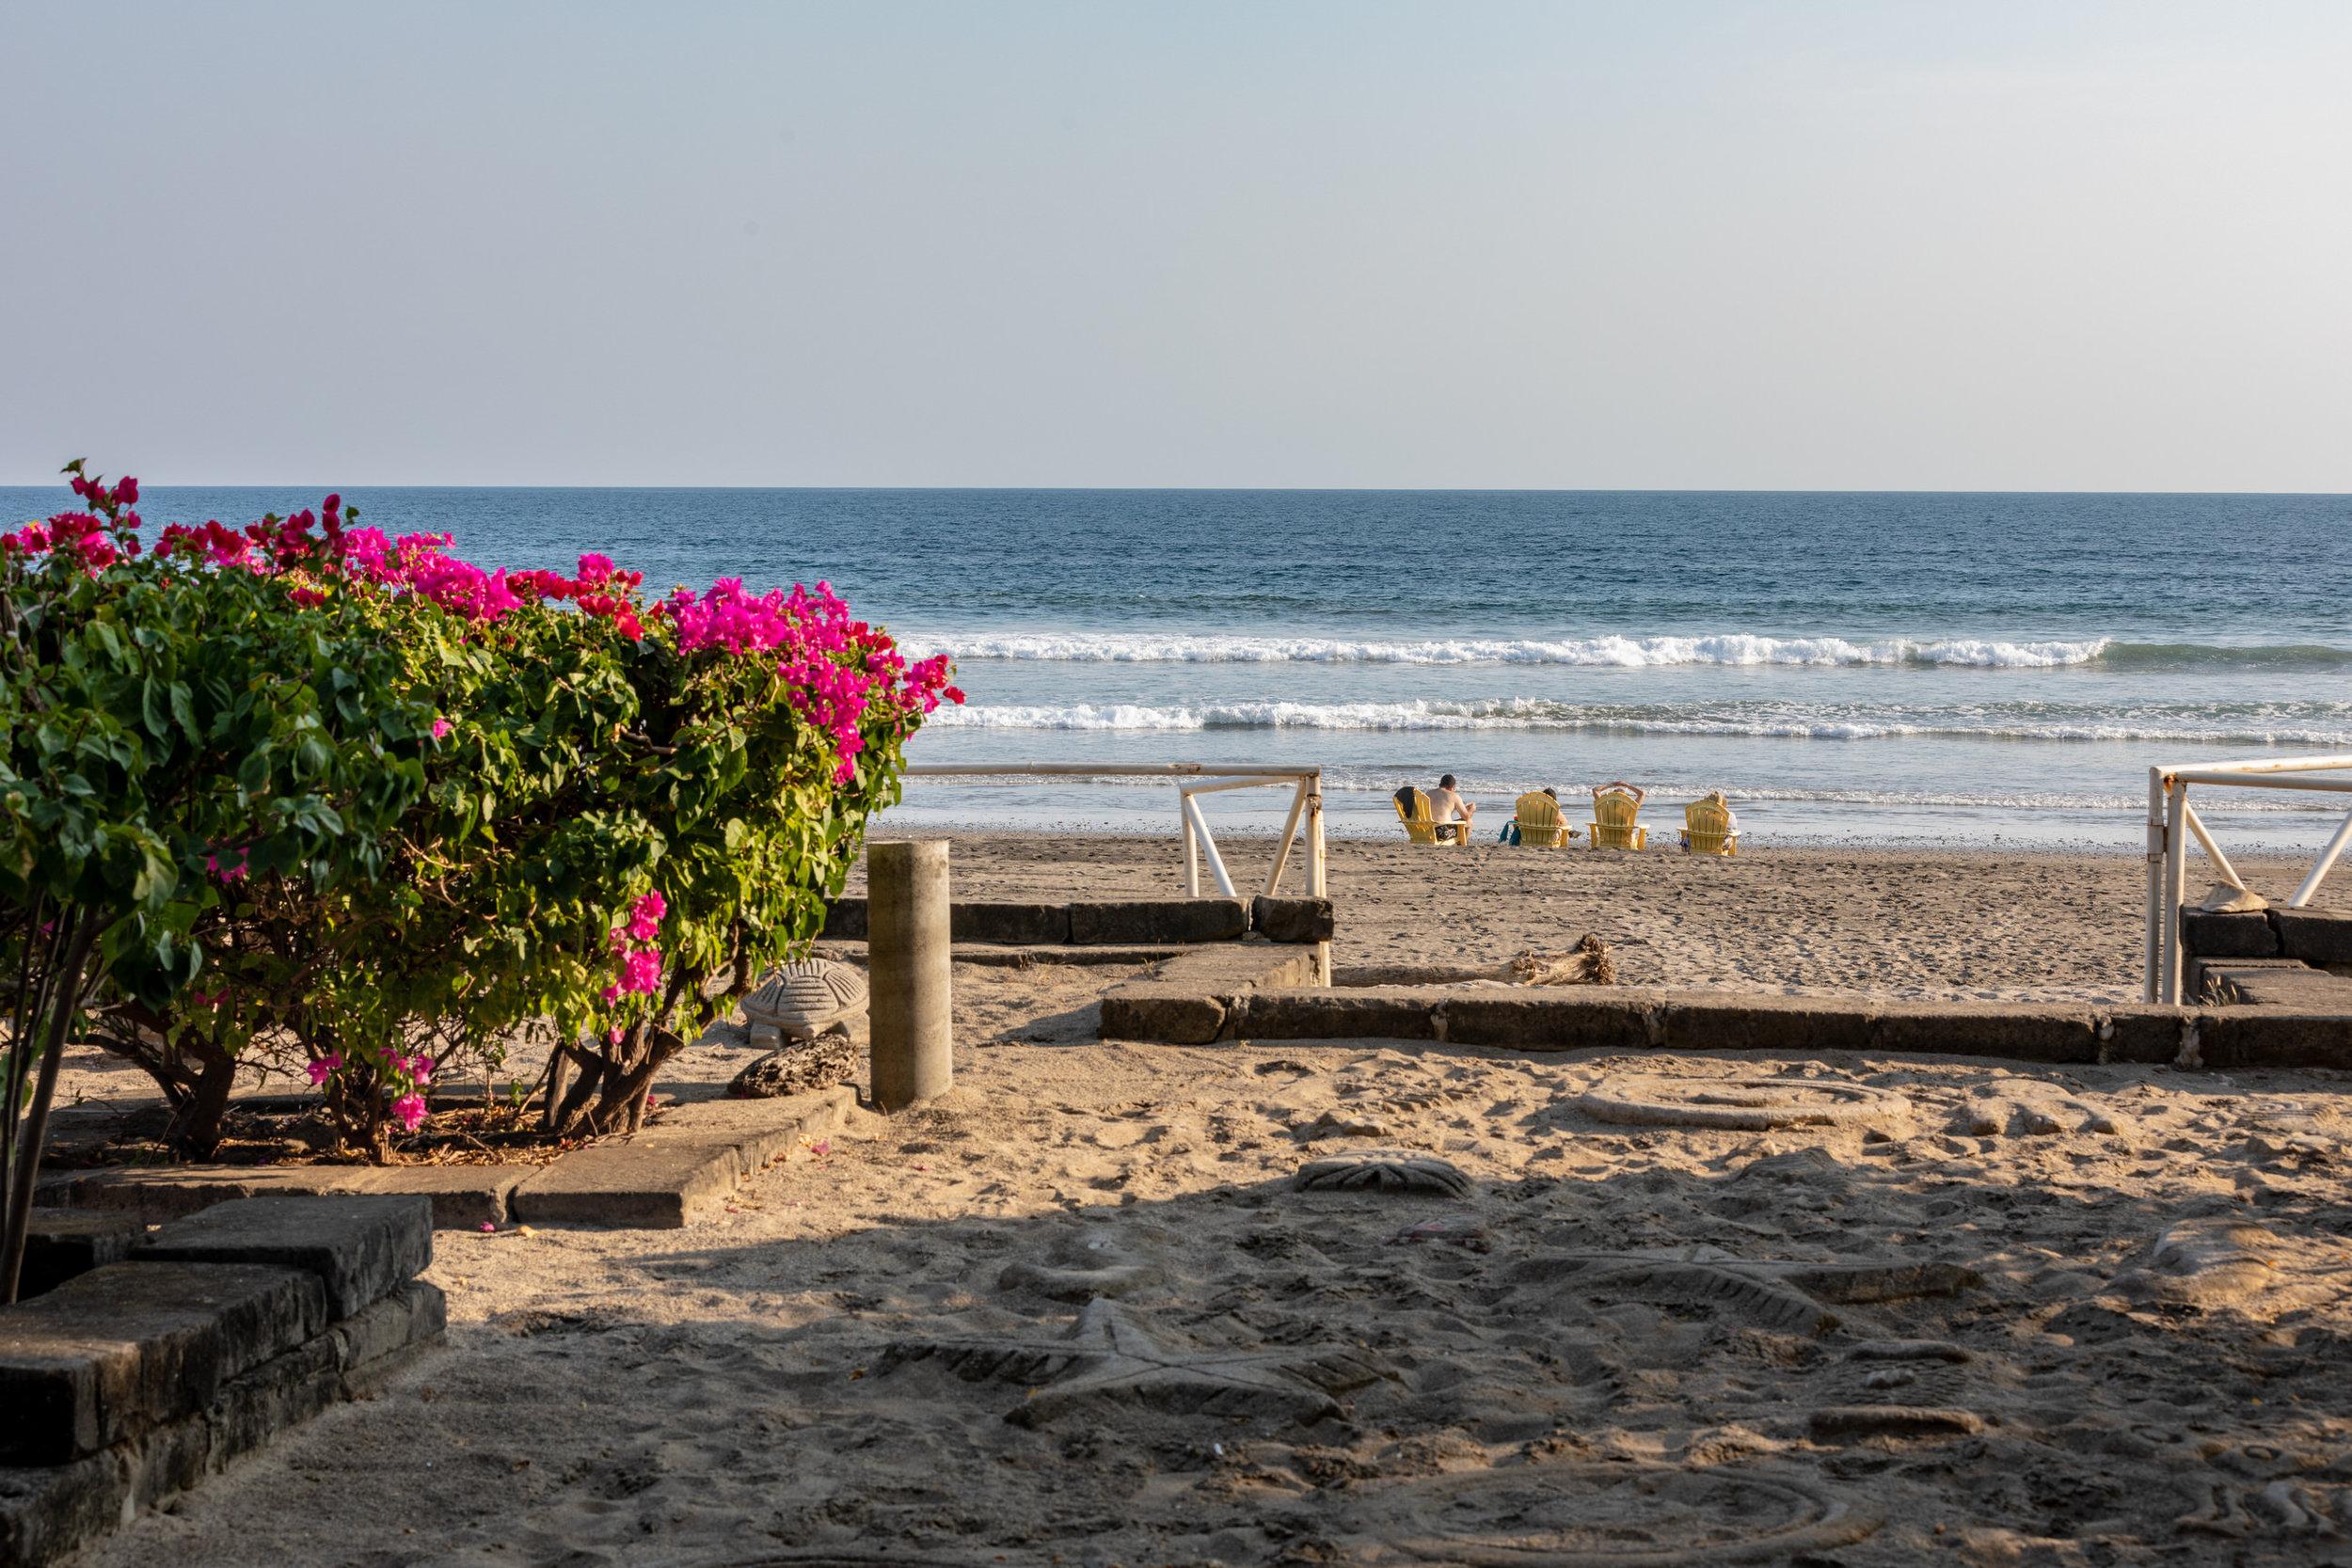 Day 5: Playa Huehuete